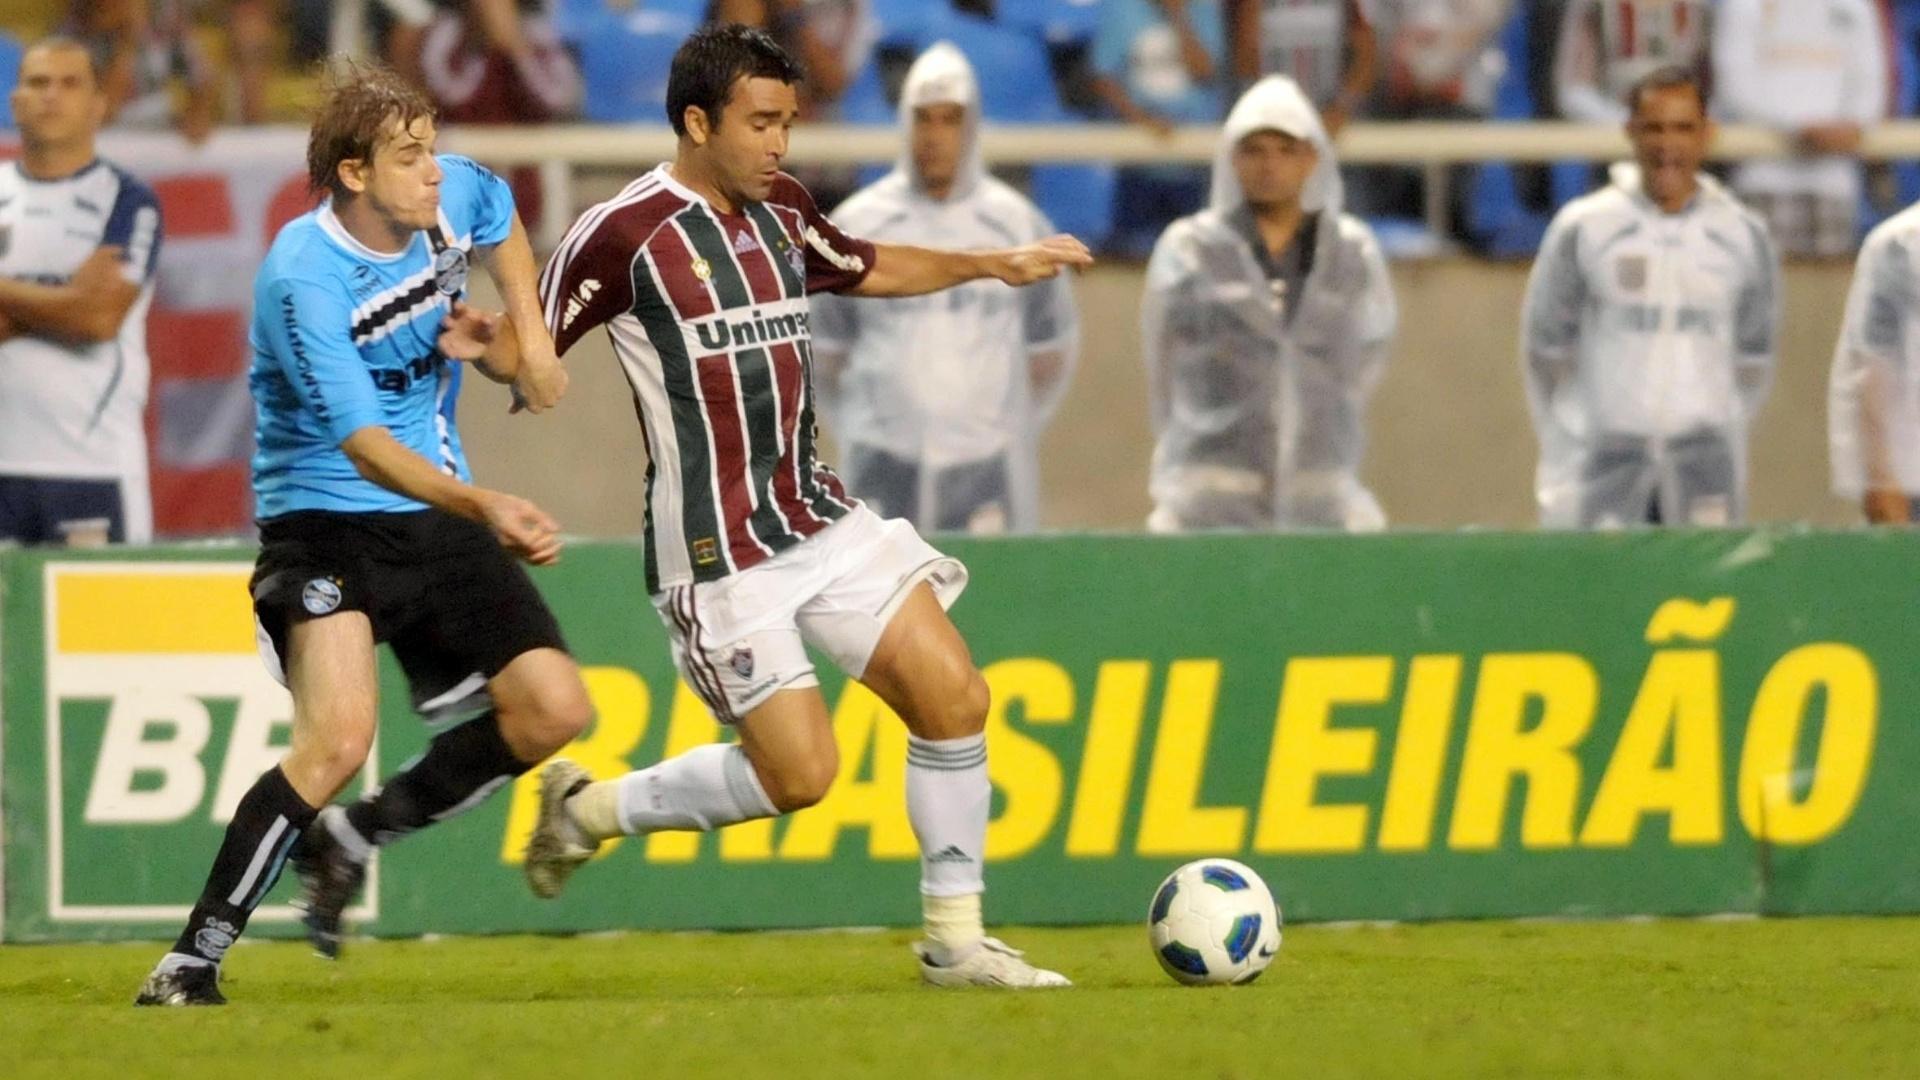 Deco deu passe para Fred marcar o segundo do Fluminense contra o Grêmio, pelo Campeonato Brasileiro